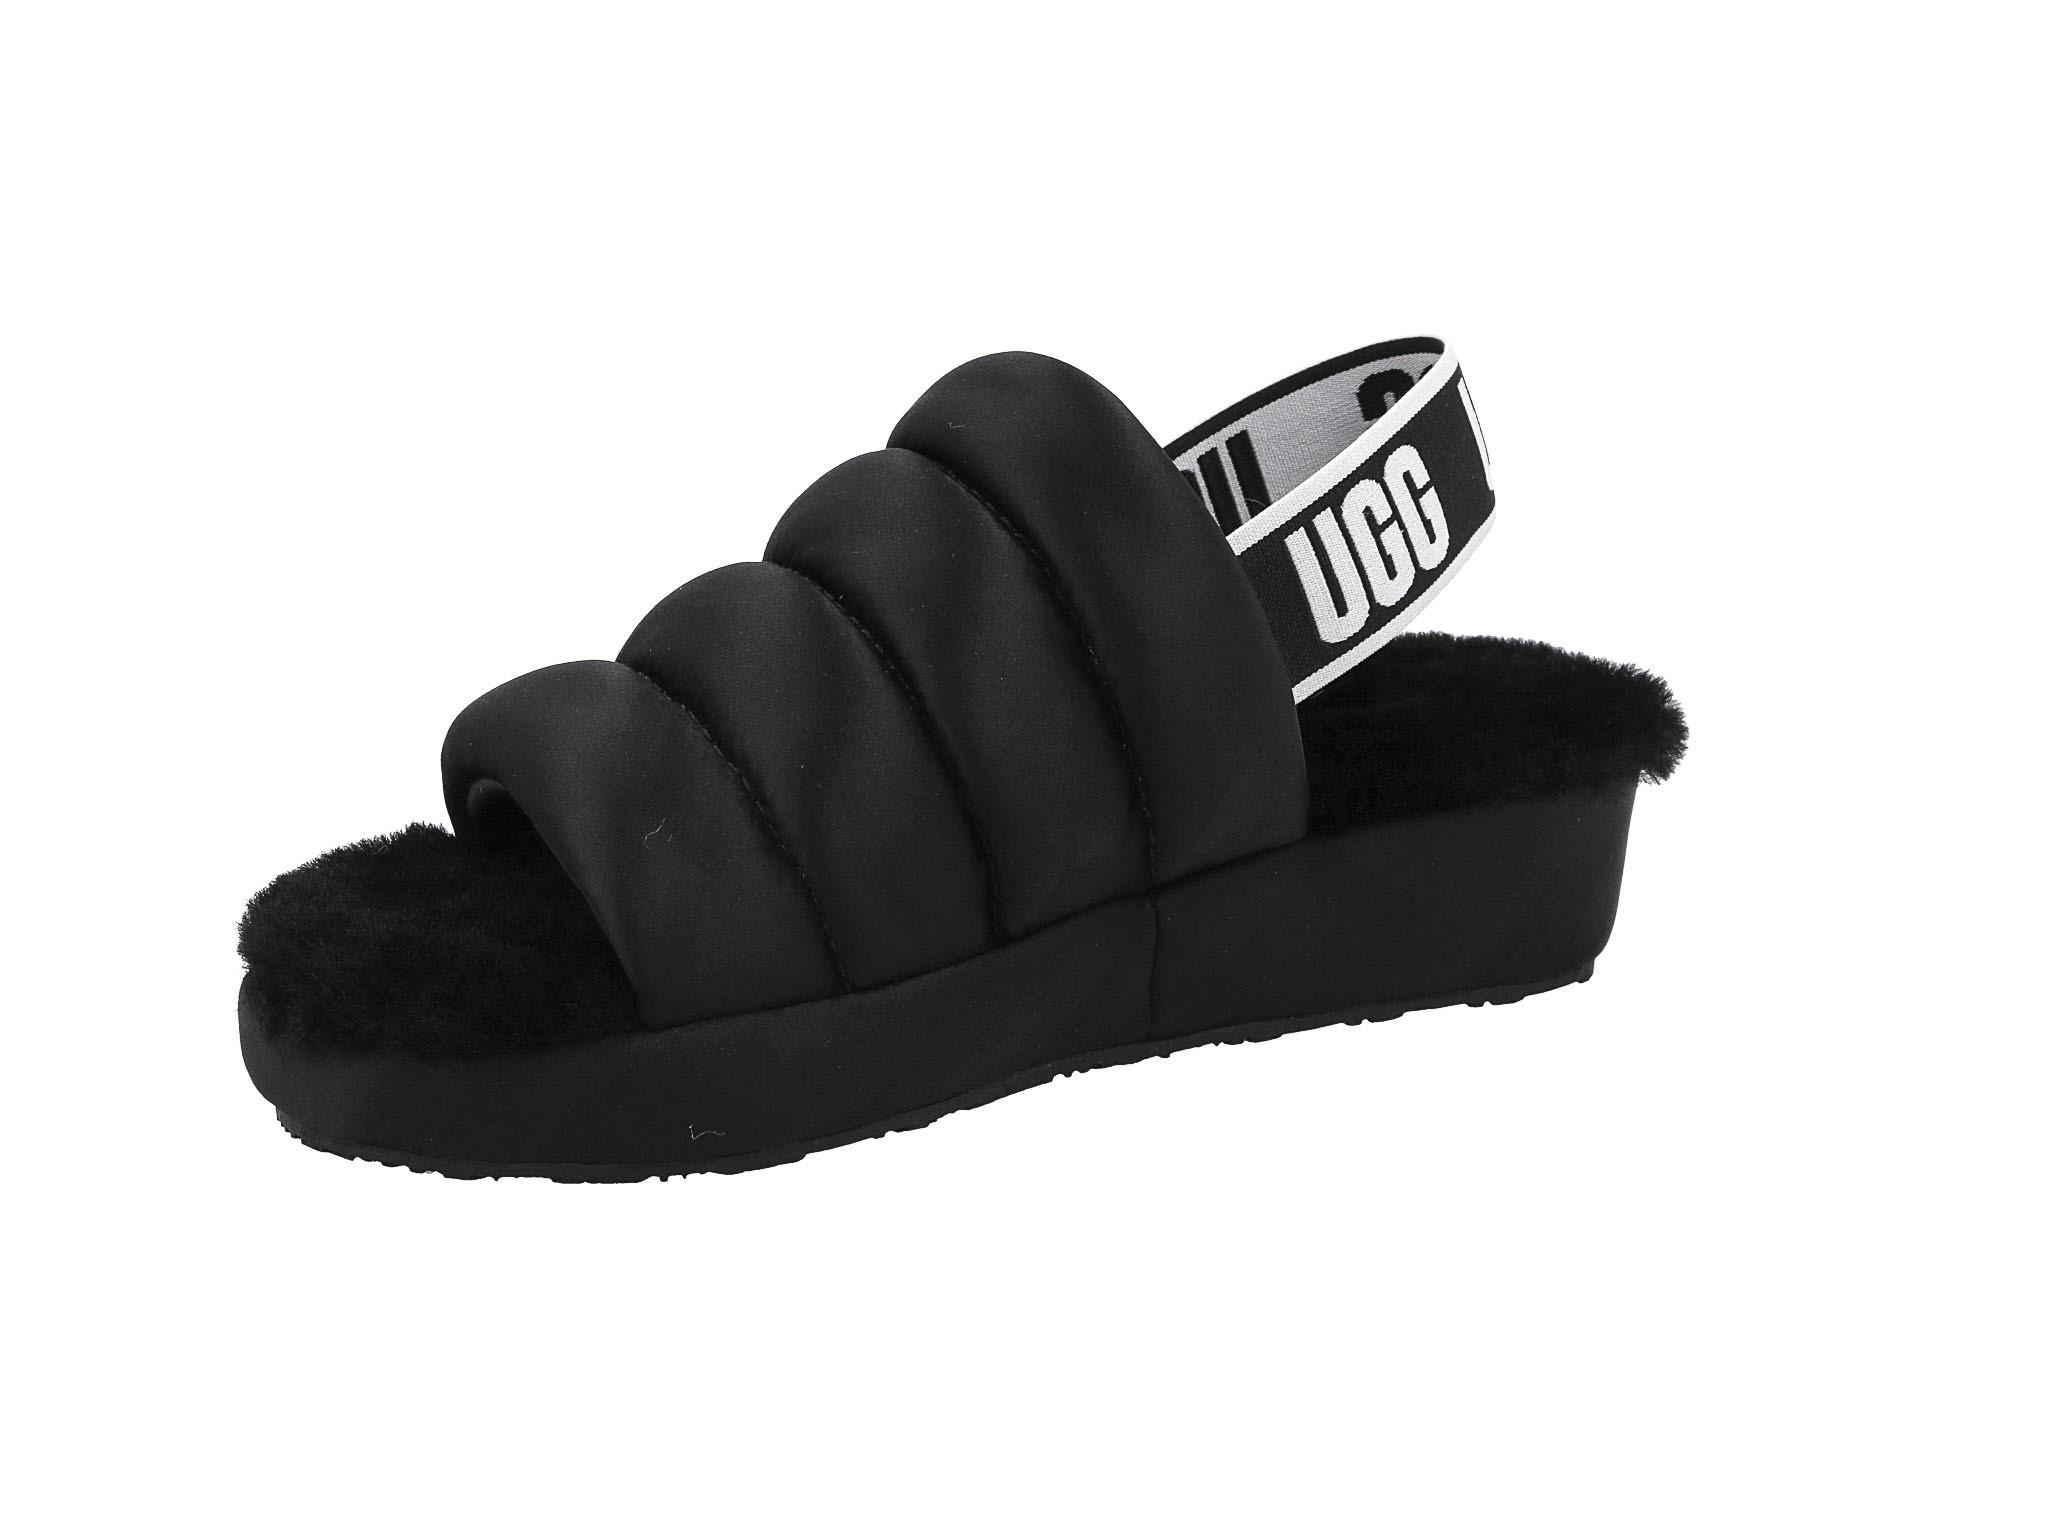 Sandały UGG - W Puff Yeah 1106875 Blk/Black